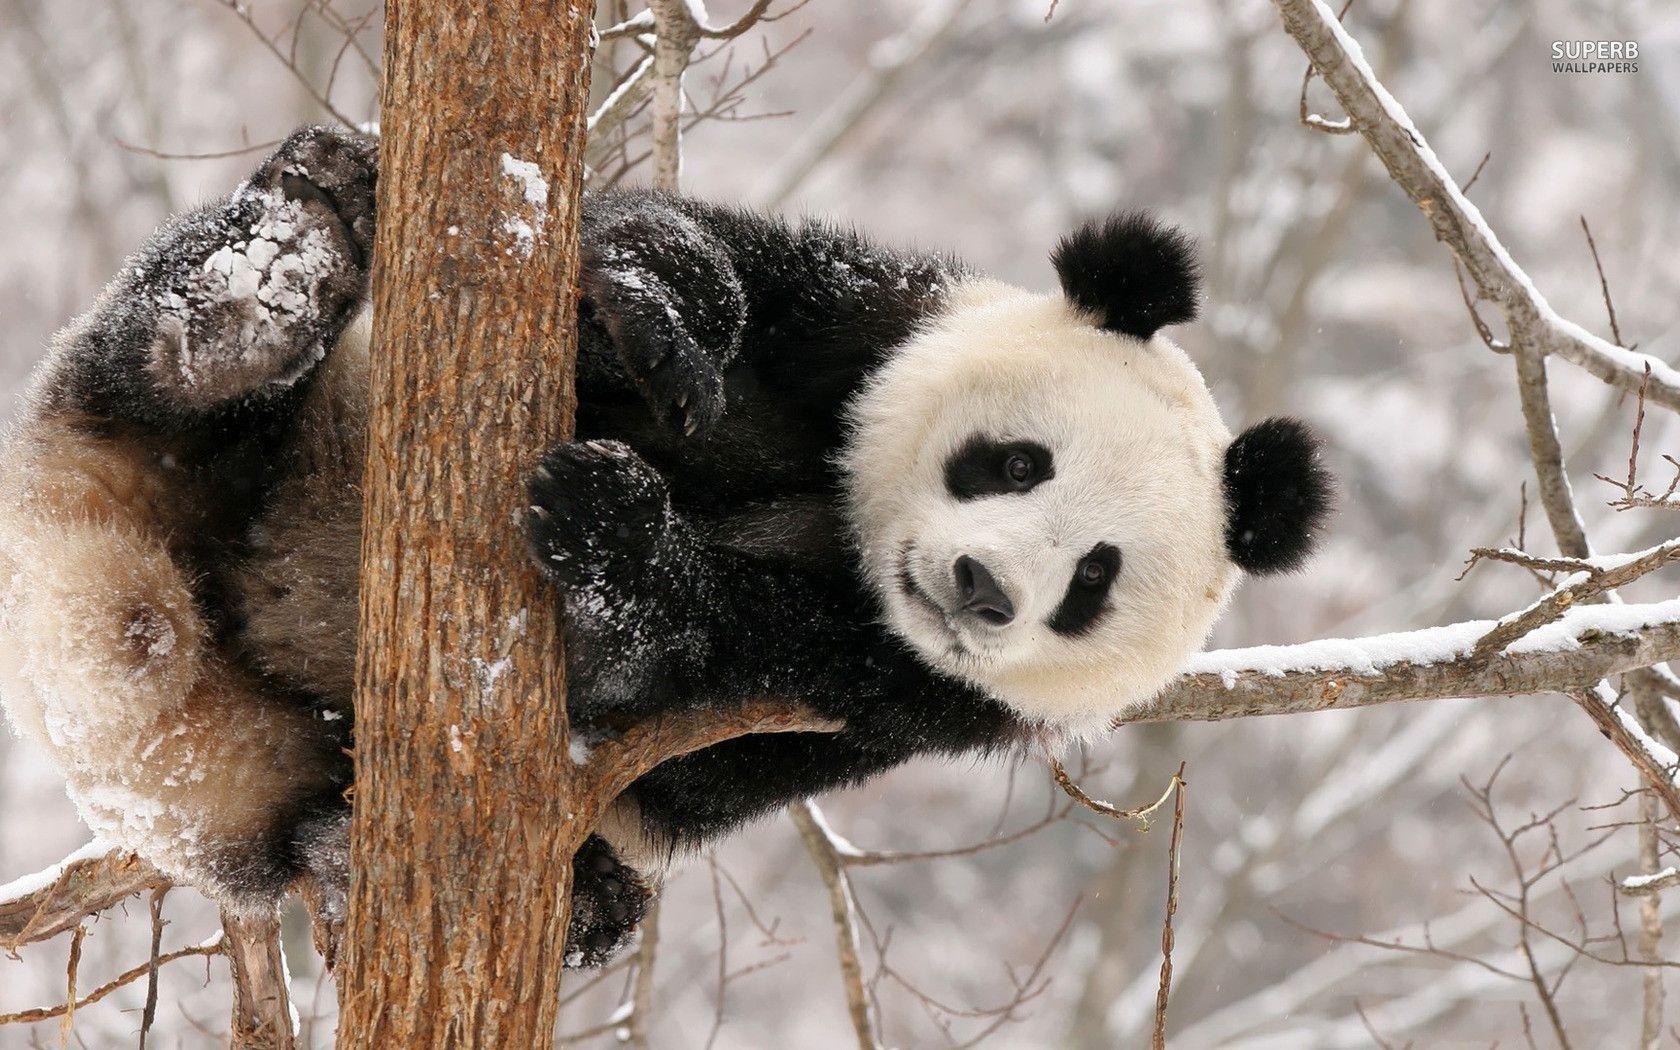 Panda Bear Wallpaper Www Wallpaper Free Download Com Panda Bear Panda Bears Wallpaper Panda